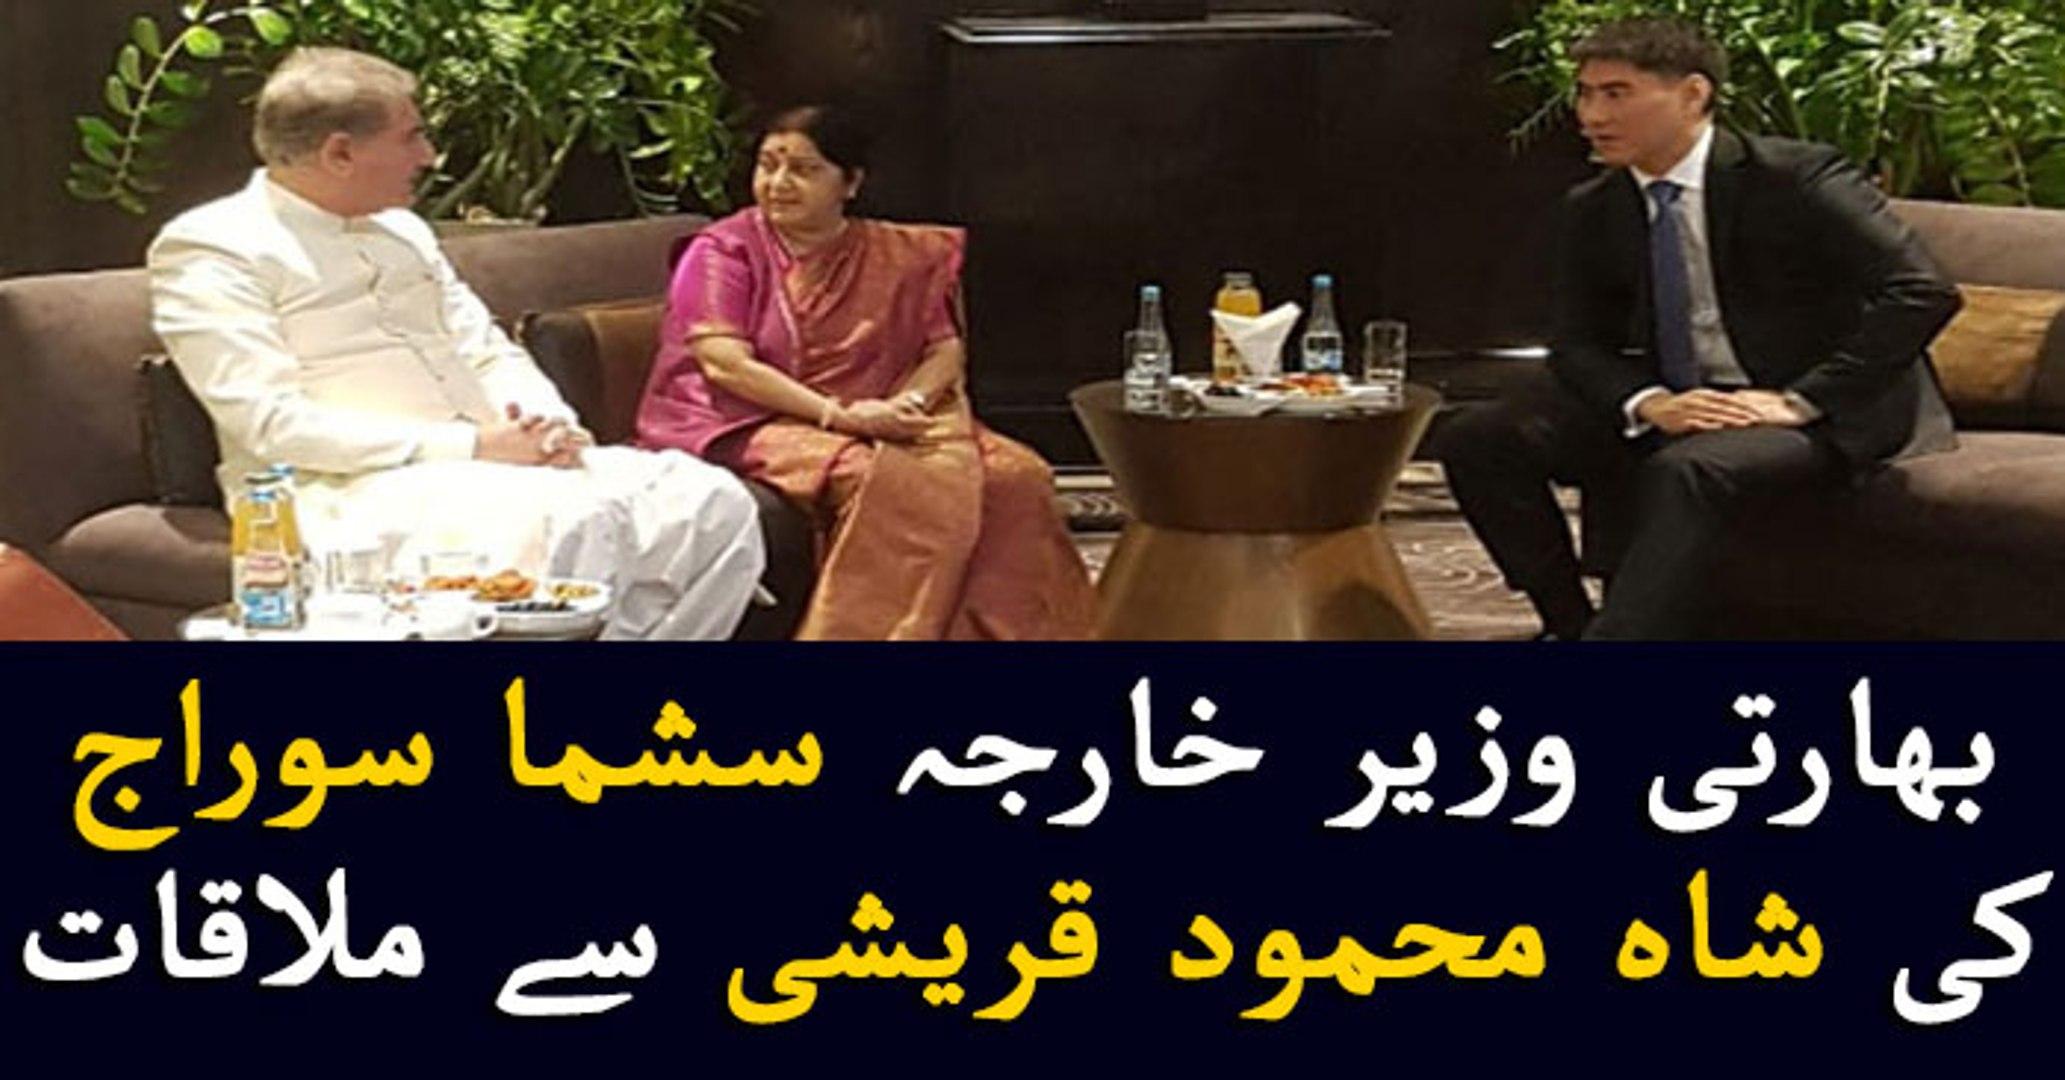 FM India Sushma Swaraj meets FM Pakistan Shah Mehmood Qureshi